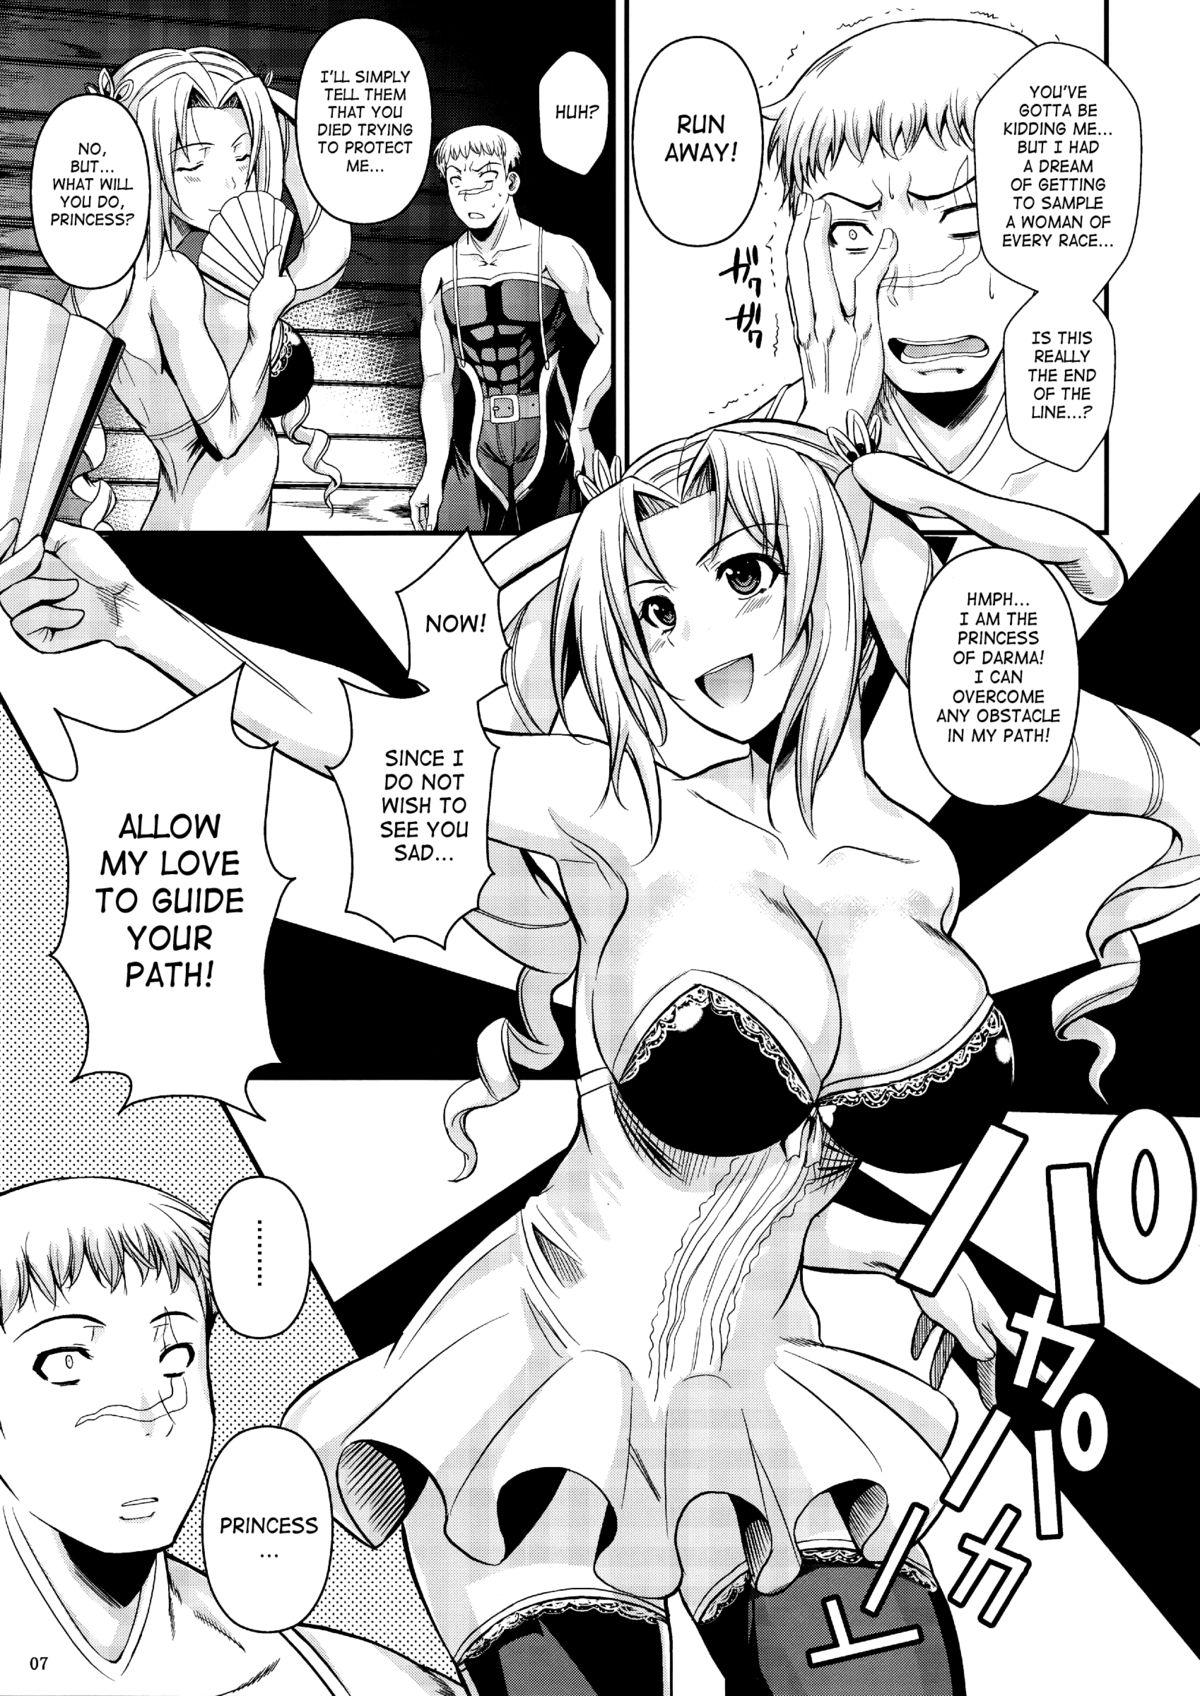 Tatta Hitori no Youheidan 2 | One-Man Mercenary Army 2 7